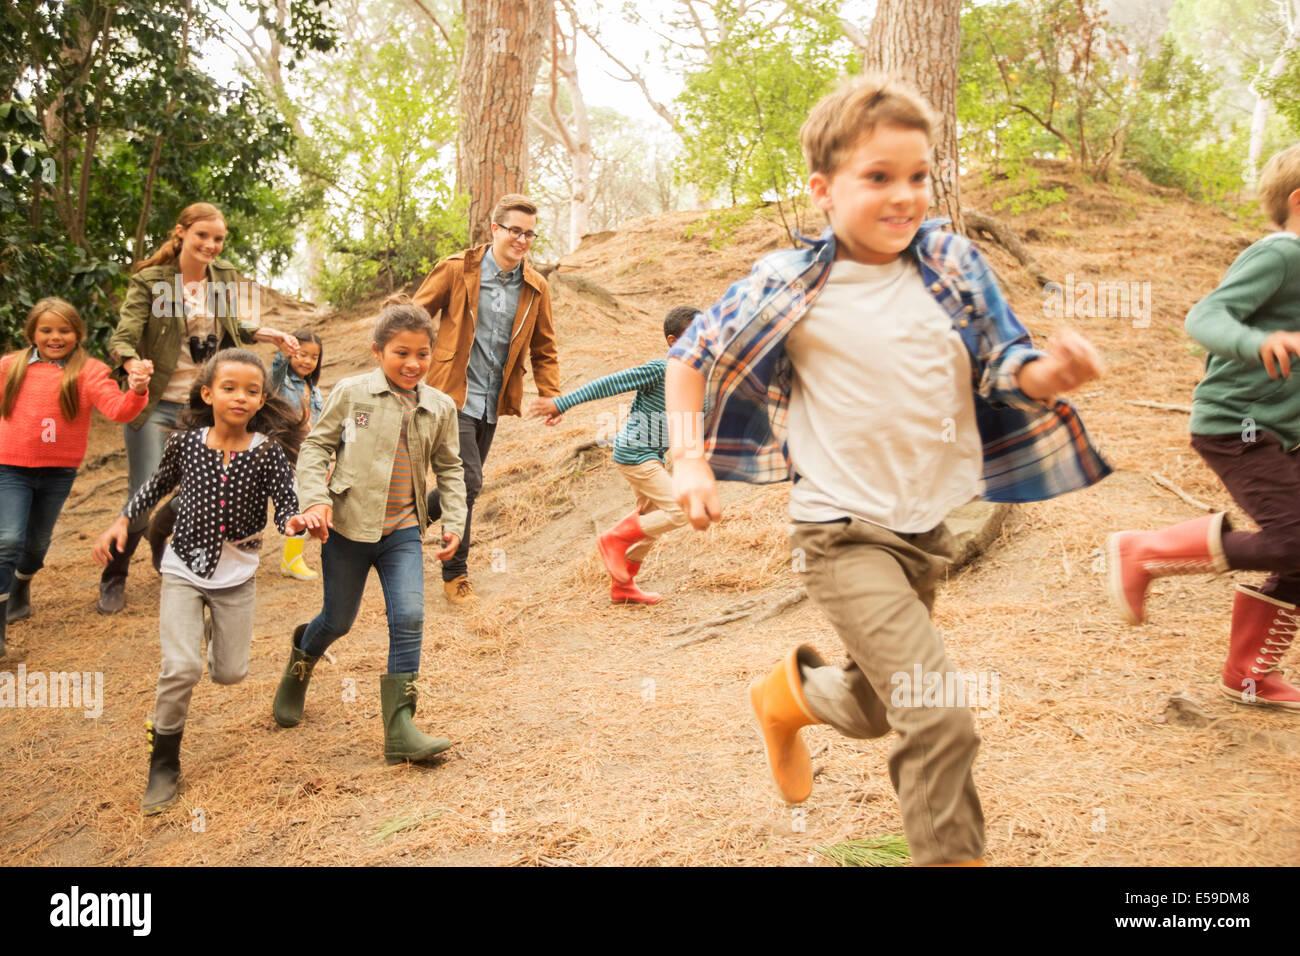 Kinder laufen im Wald Stockbild